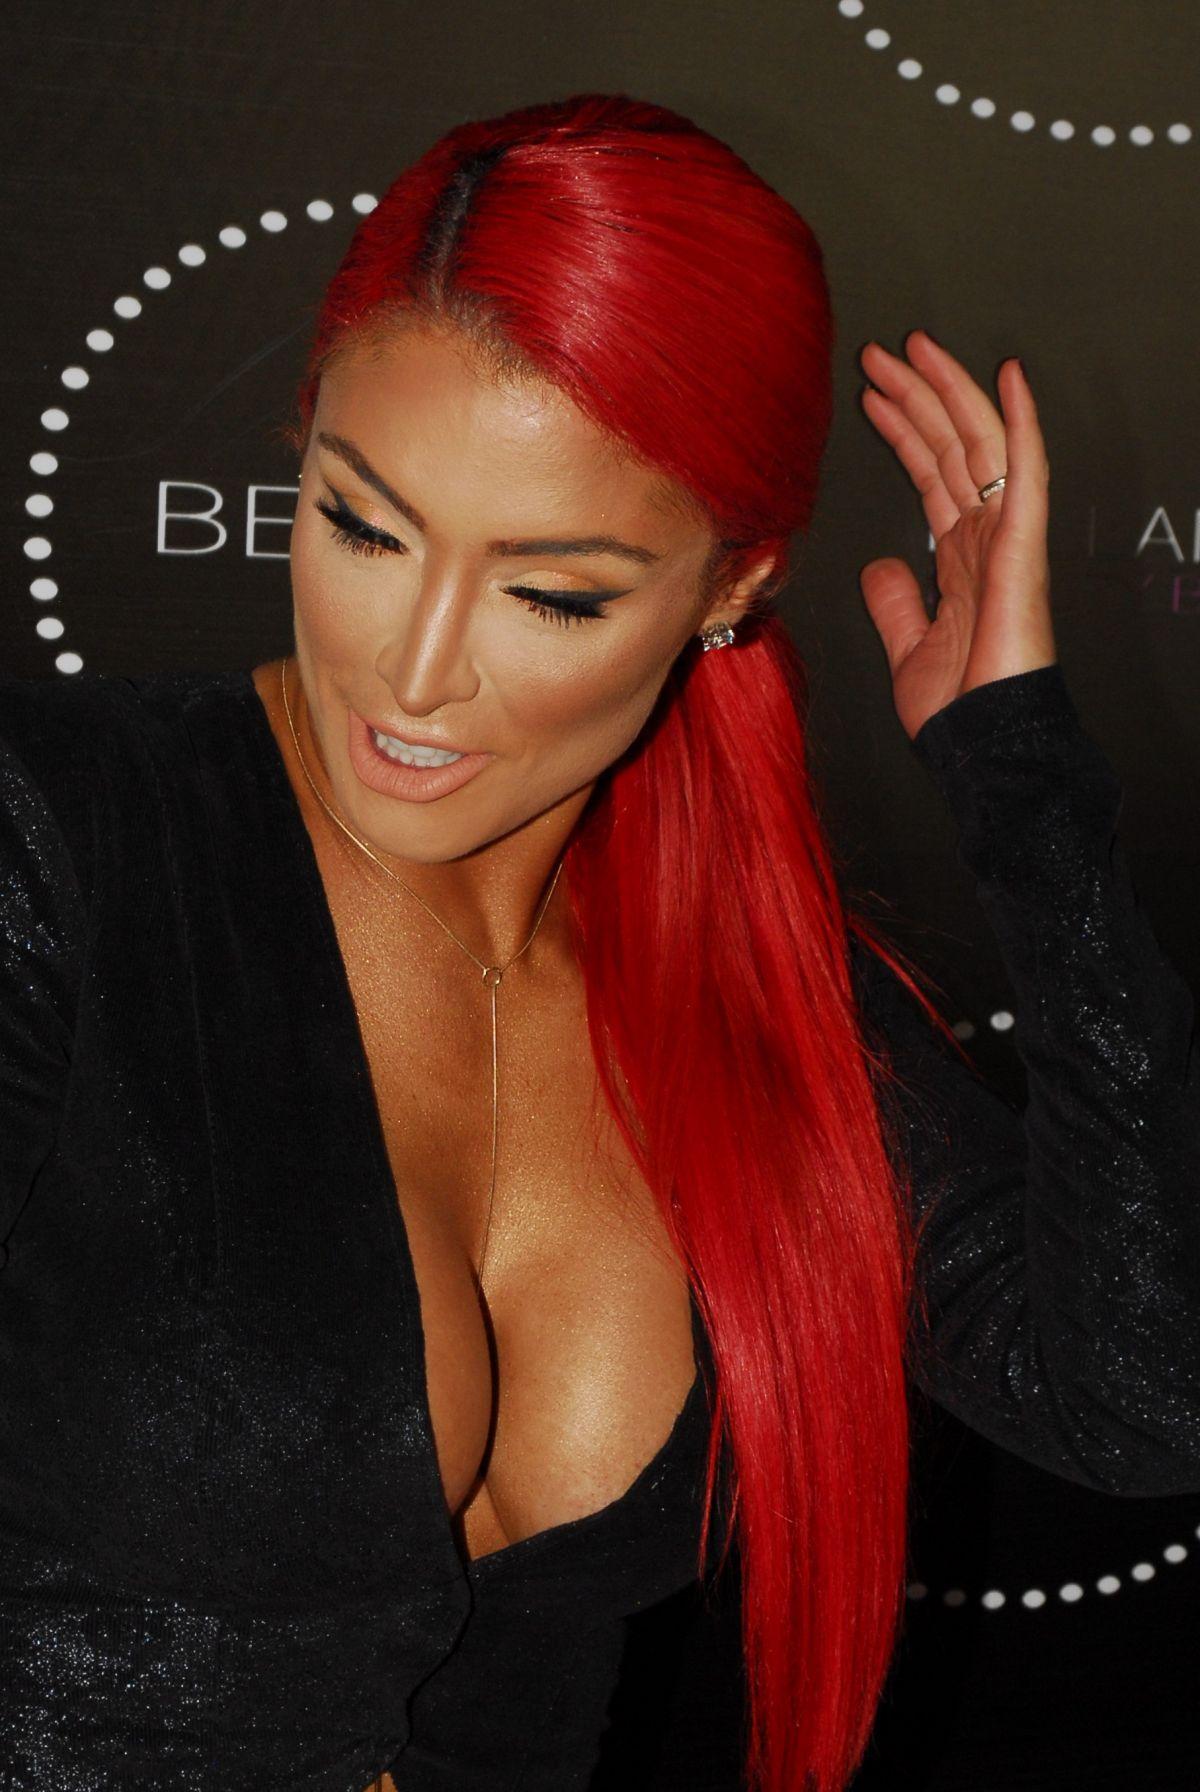 EVA MARIE at Bellami Beauty Bar in West Hollywood 05/05/2016 - HawtCelebs